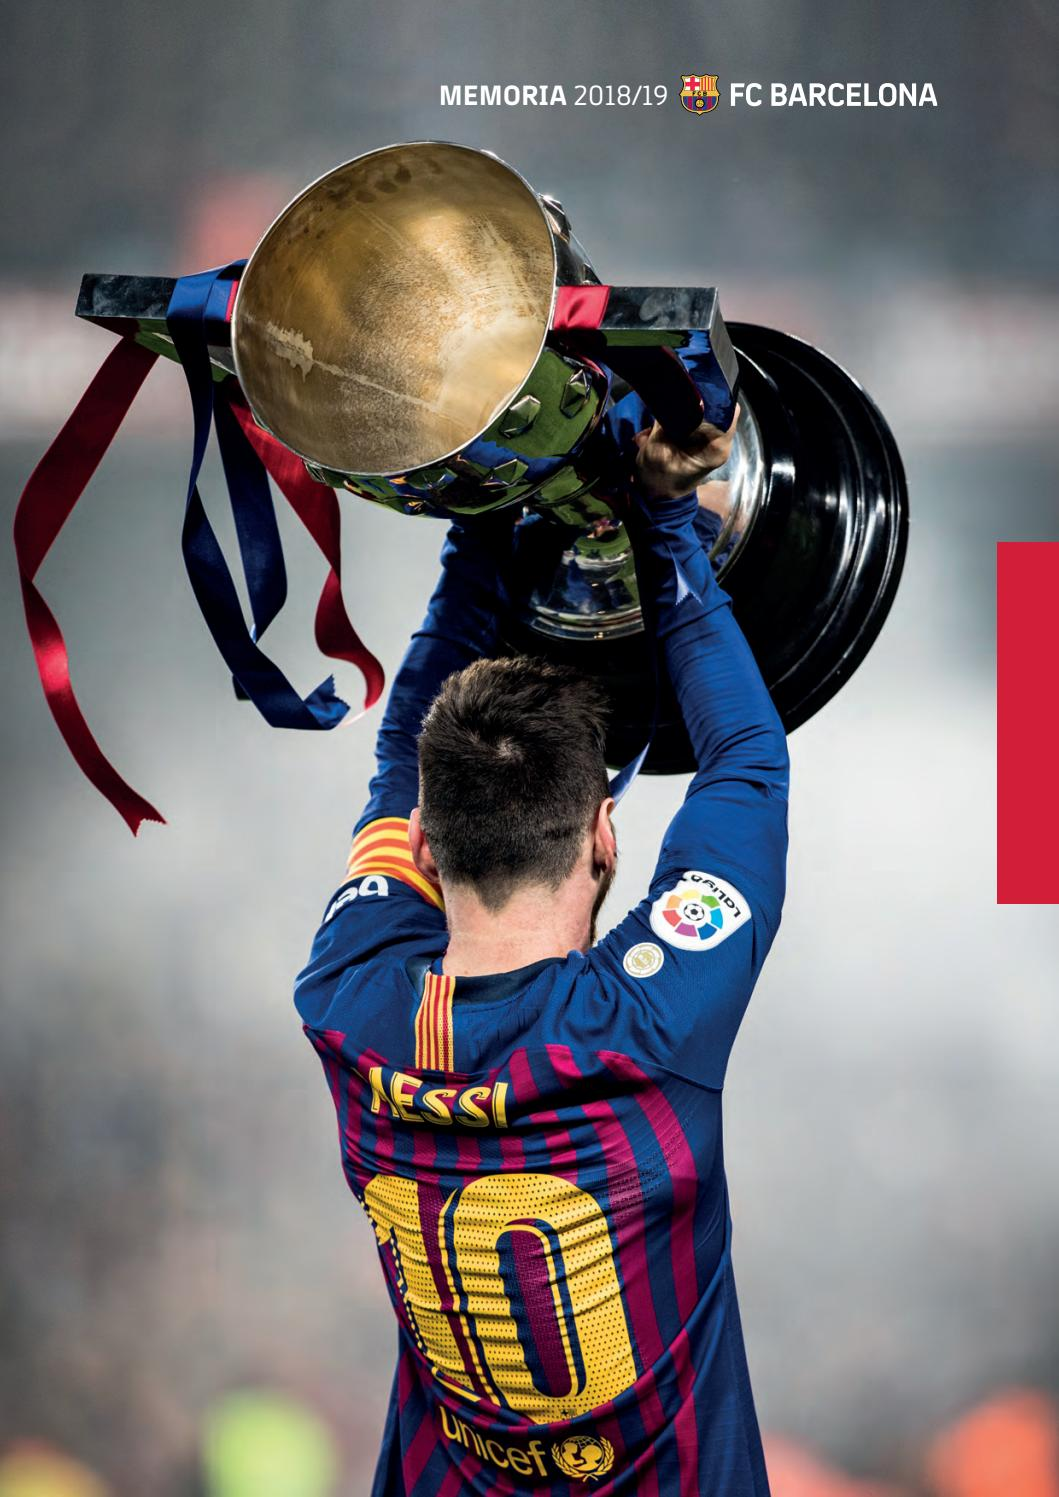 Match coronó 2015//16 liga de campeones-fc barcelona-mapa escoger